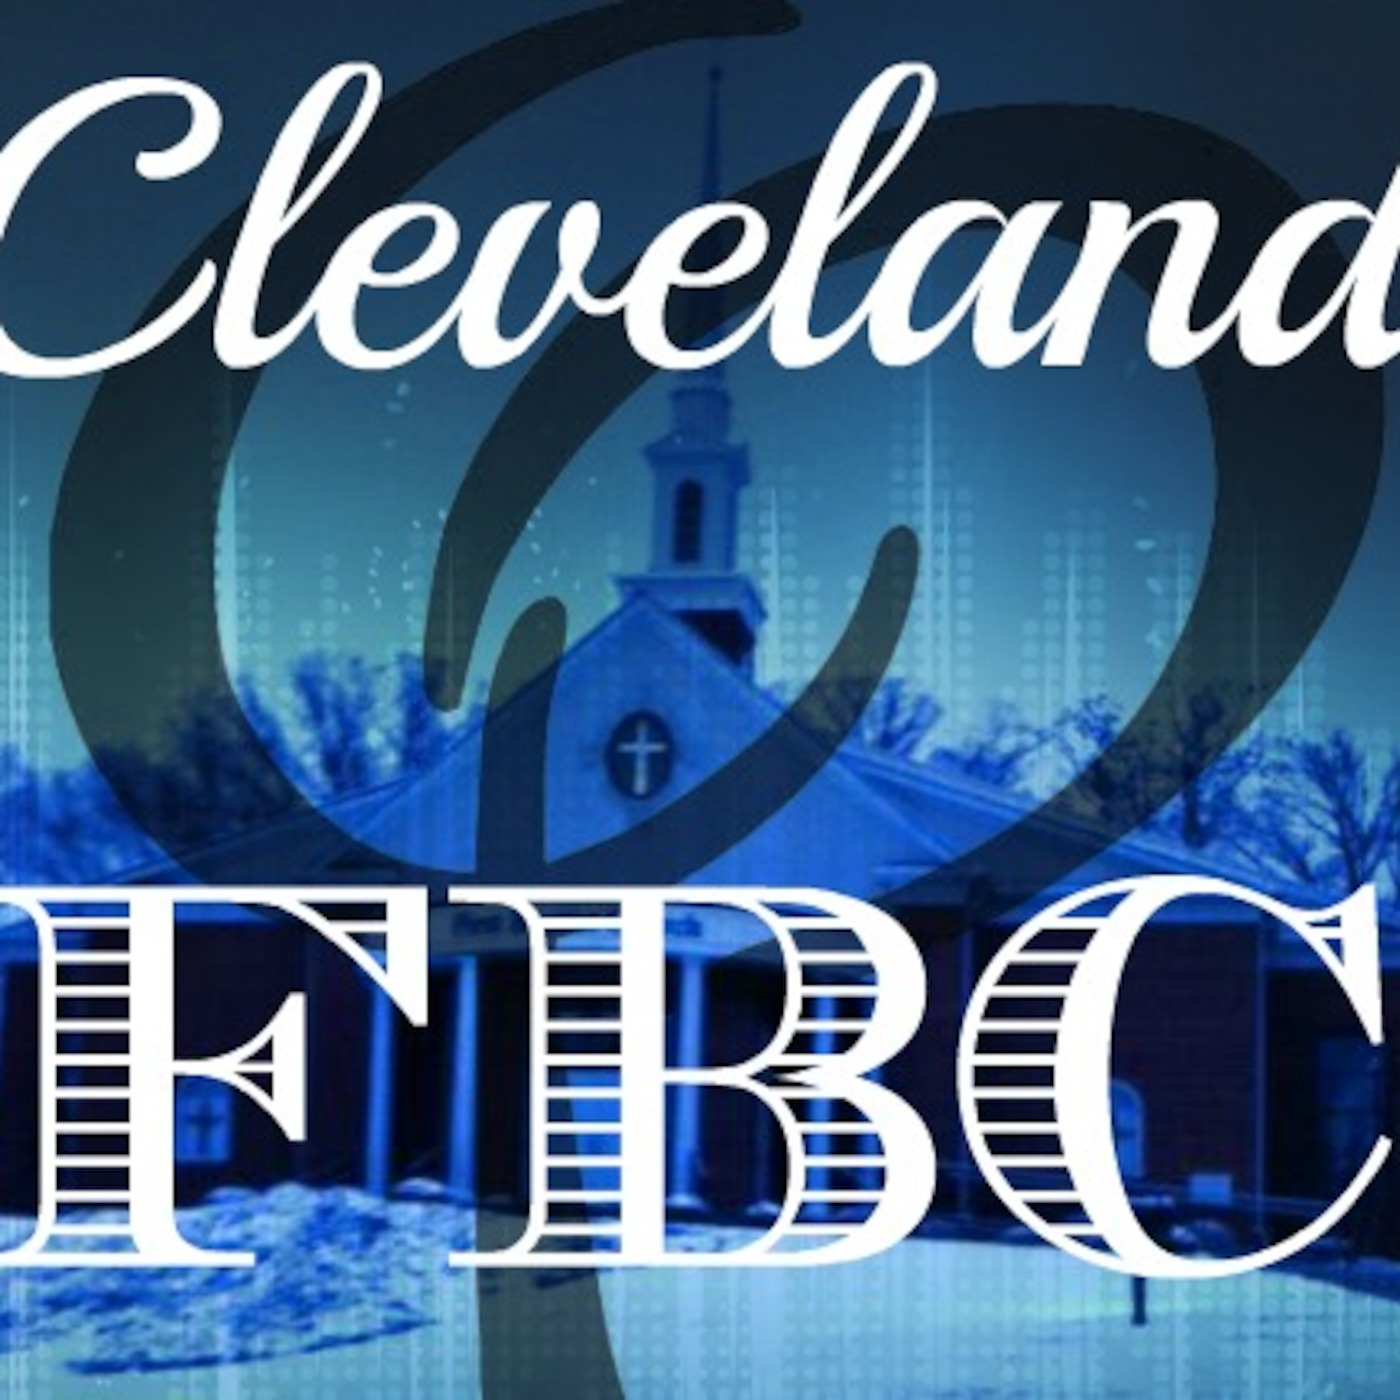 Cleveland FBC's Podcast